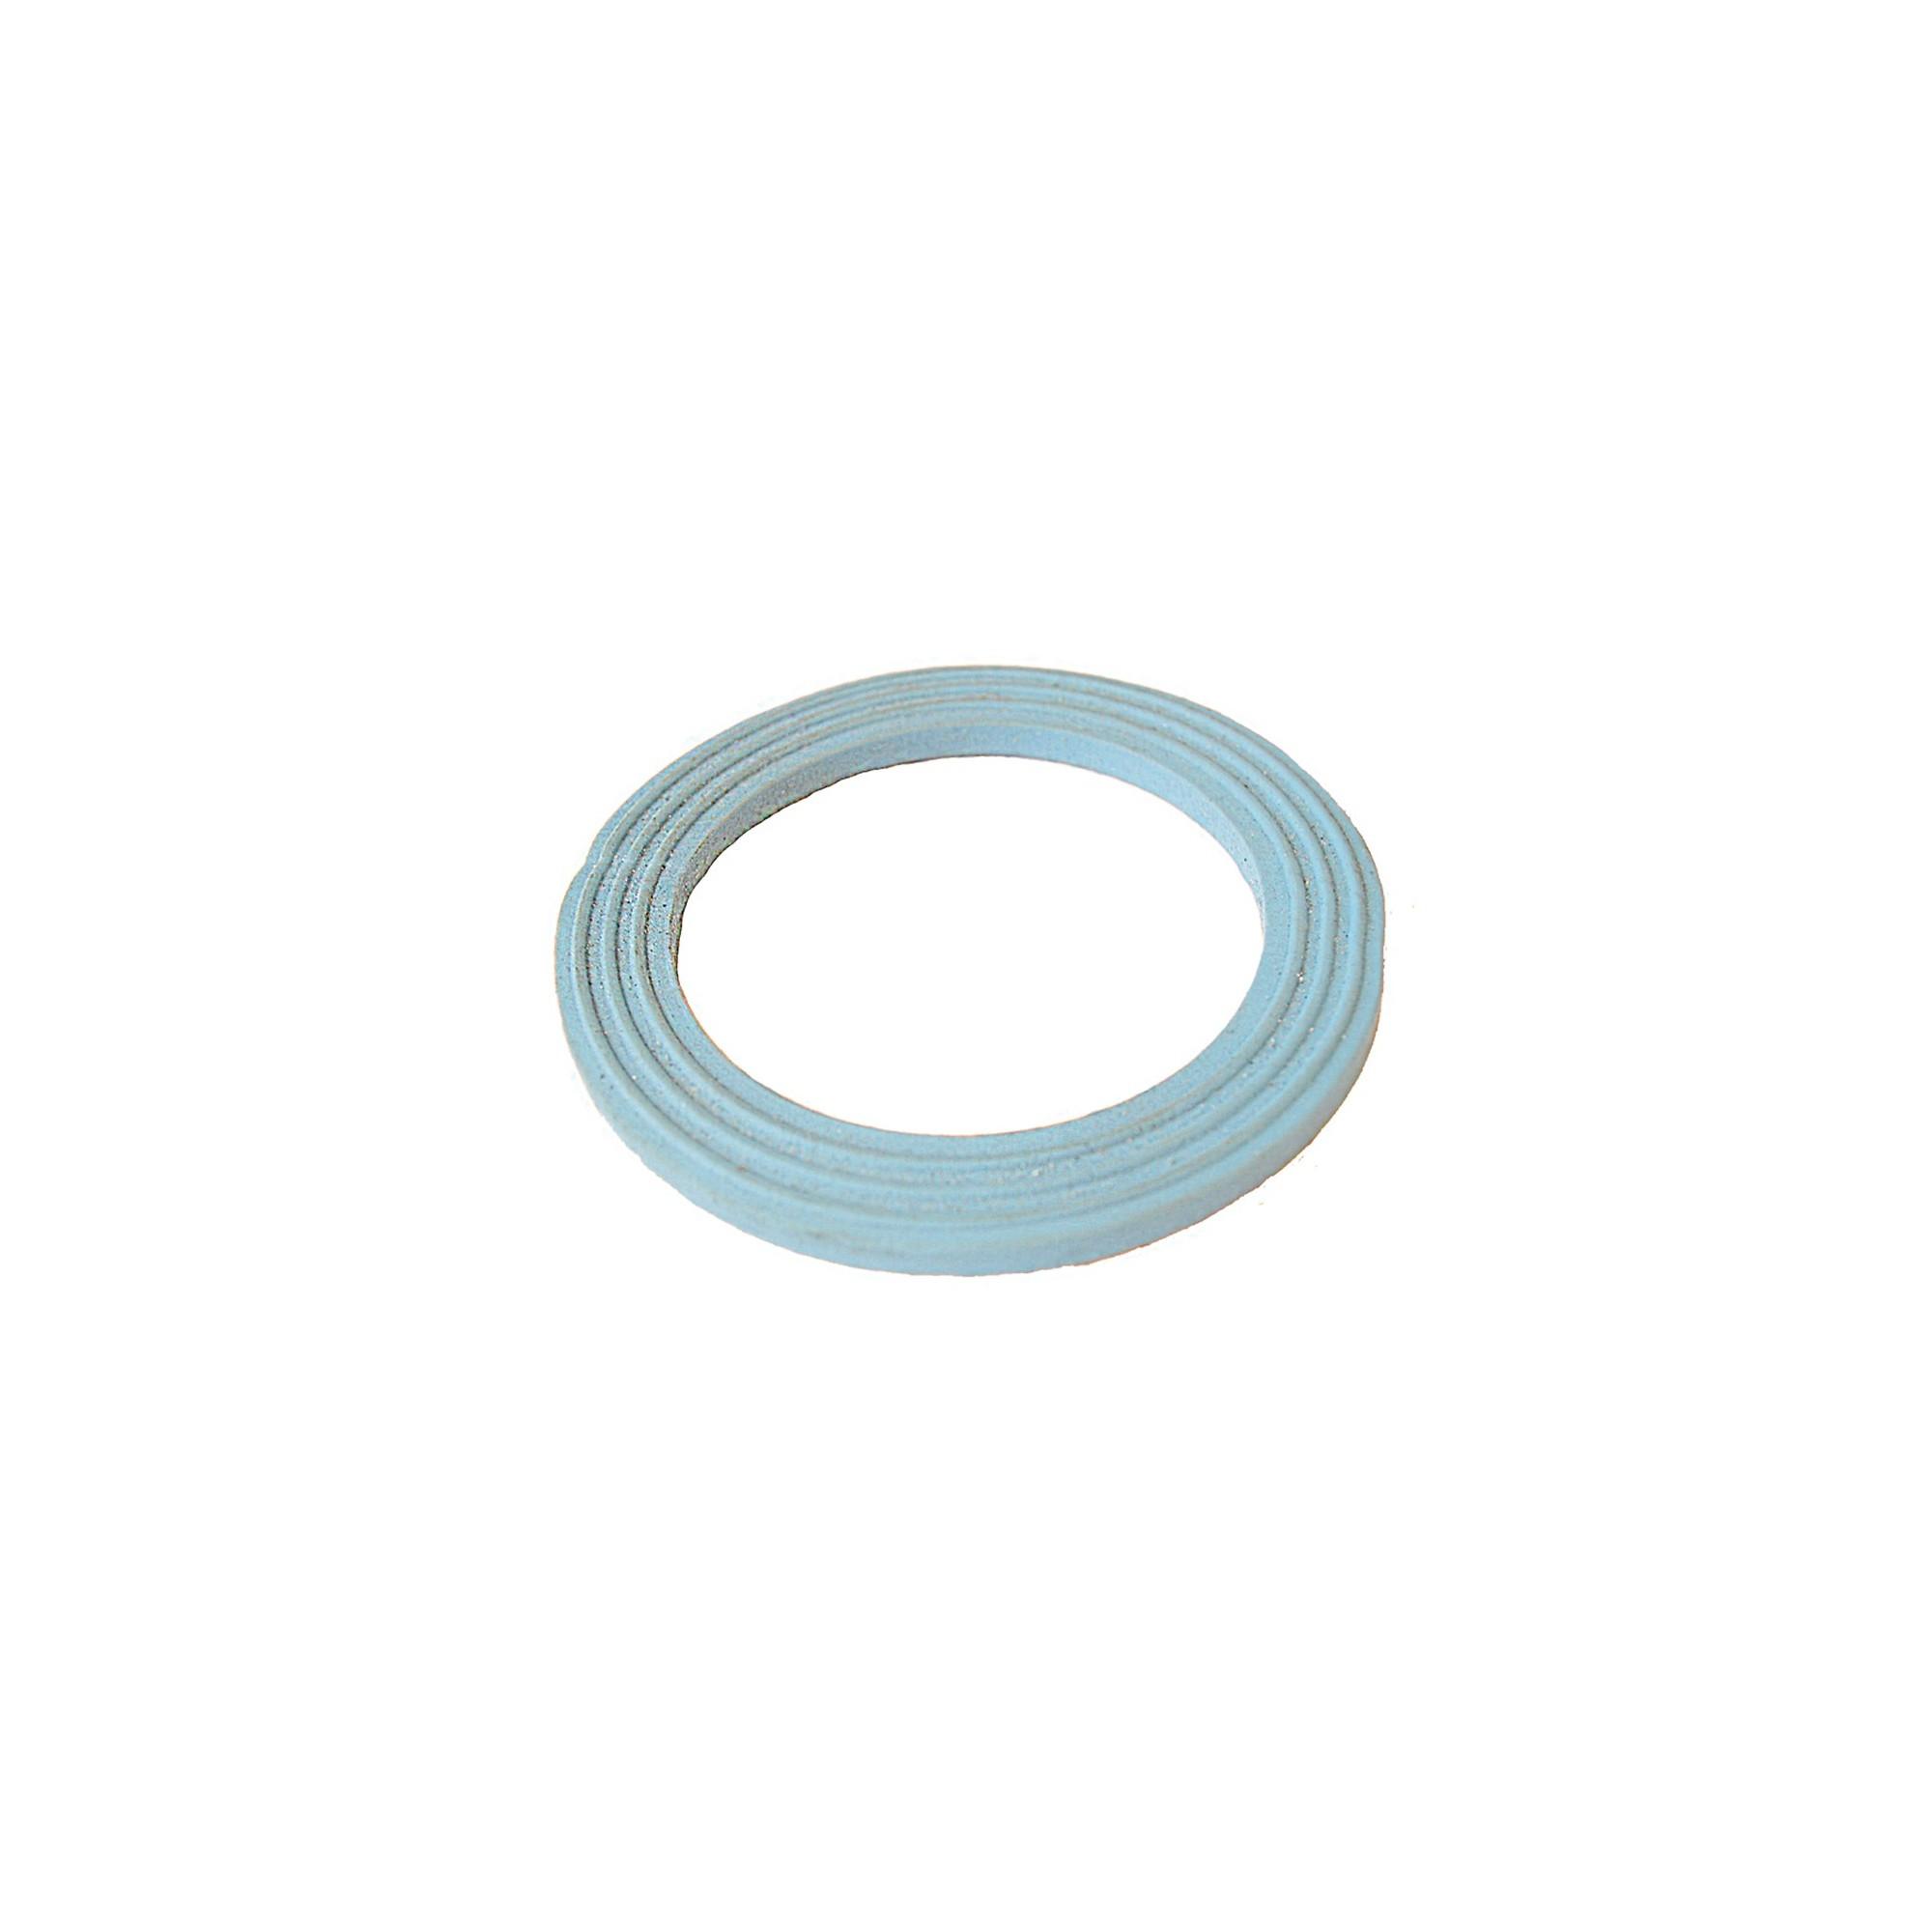 Упаковка прокладок 10 шт на сифон улитка ПВХ  - 1